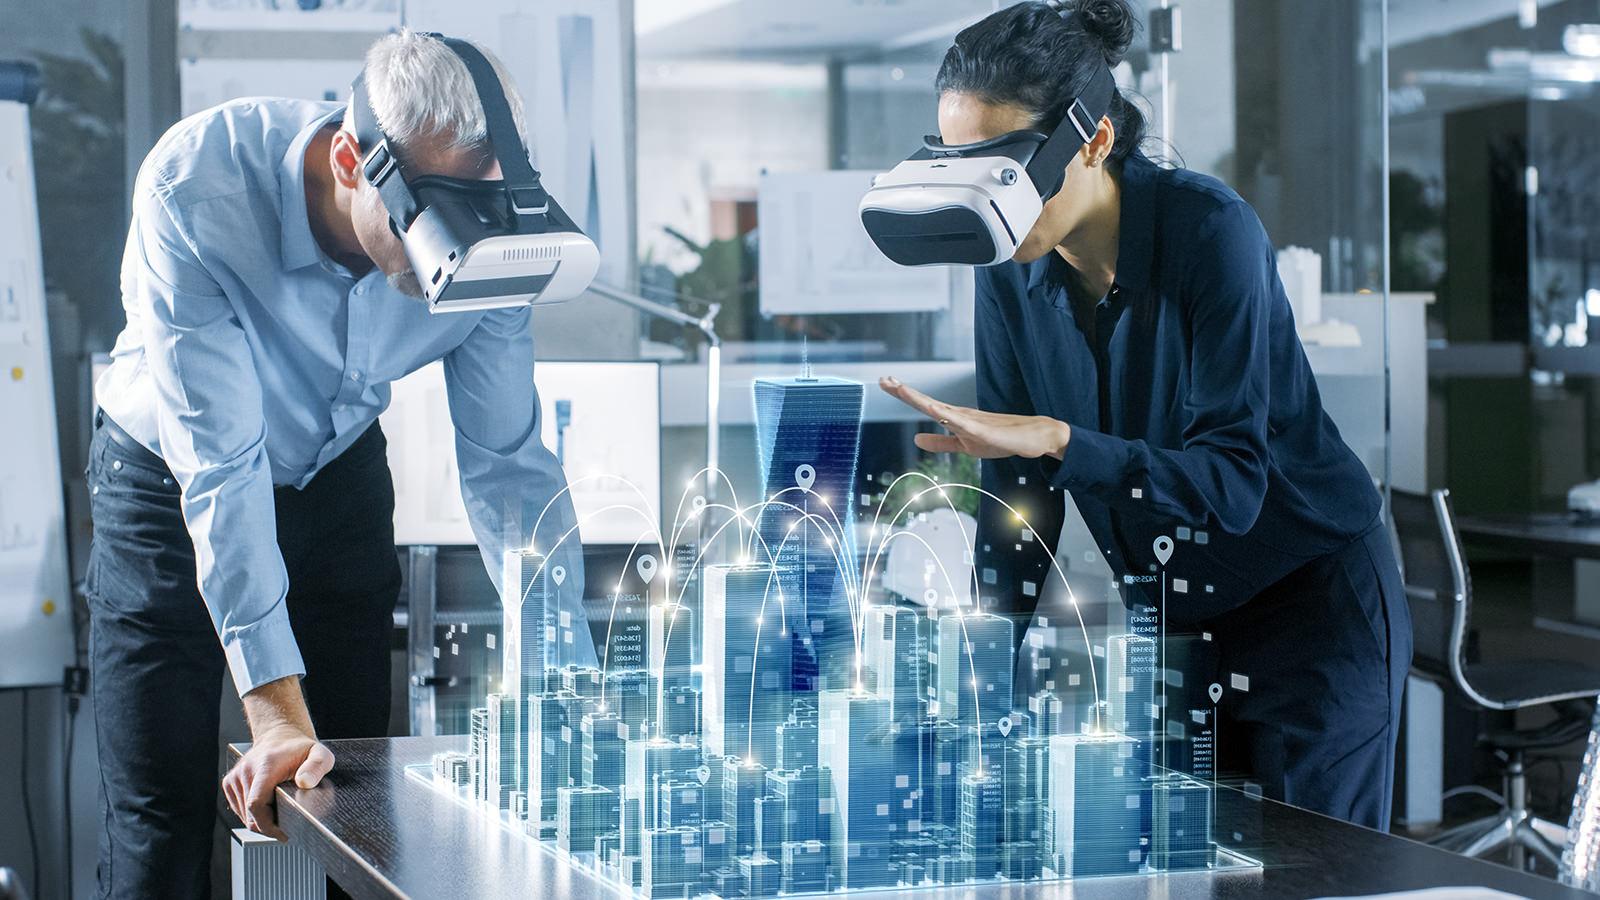 virtual reality services | Pixarch